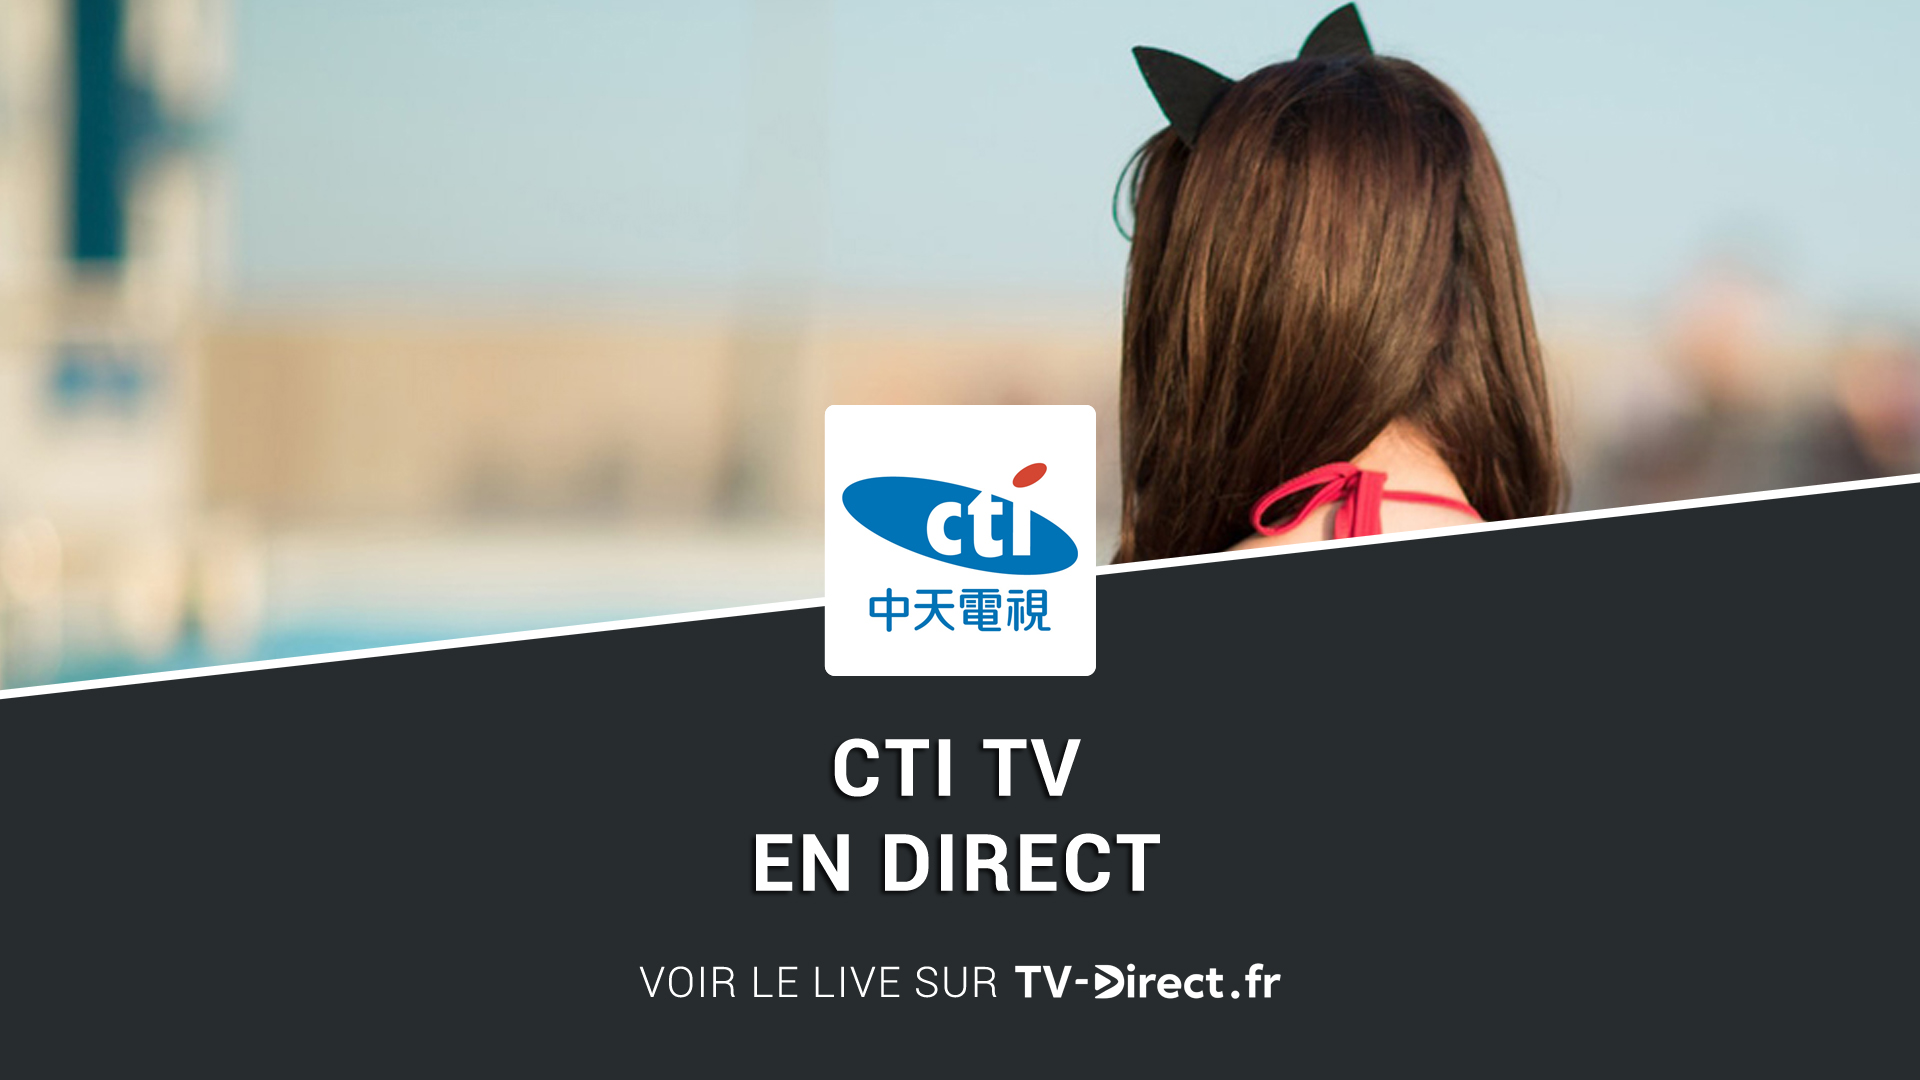 ctitv direct regarder ctitv en direct live sur internet. Black Bedroom Furniture Sets. Home Design Ideas